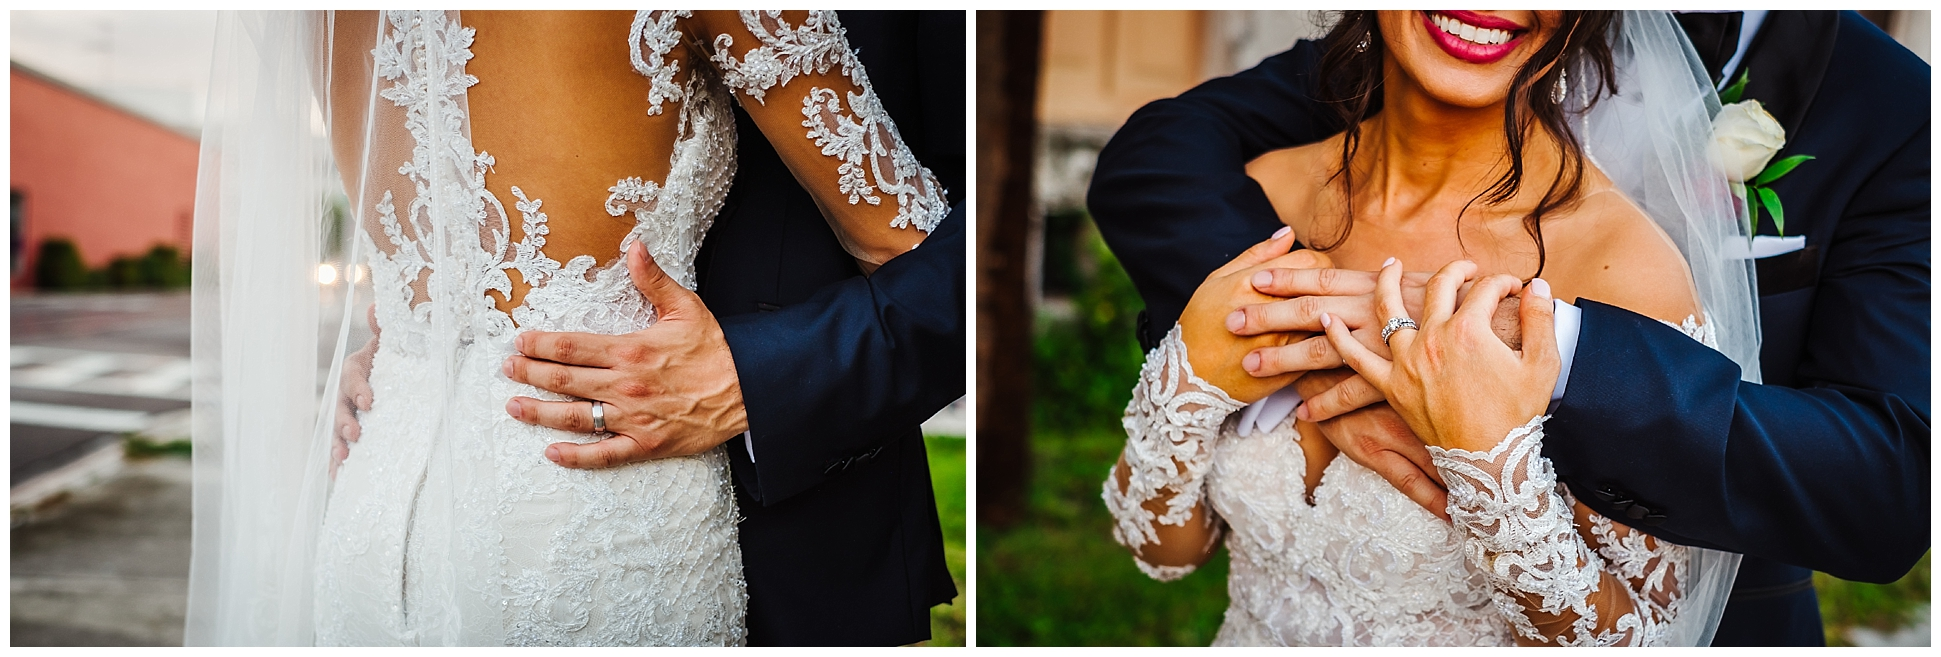 indian-armenian-clearwater-wedding-chic-luxury-photogaphy_0083.jpg